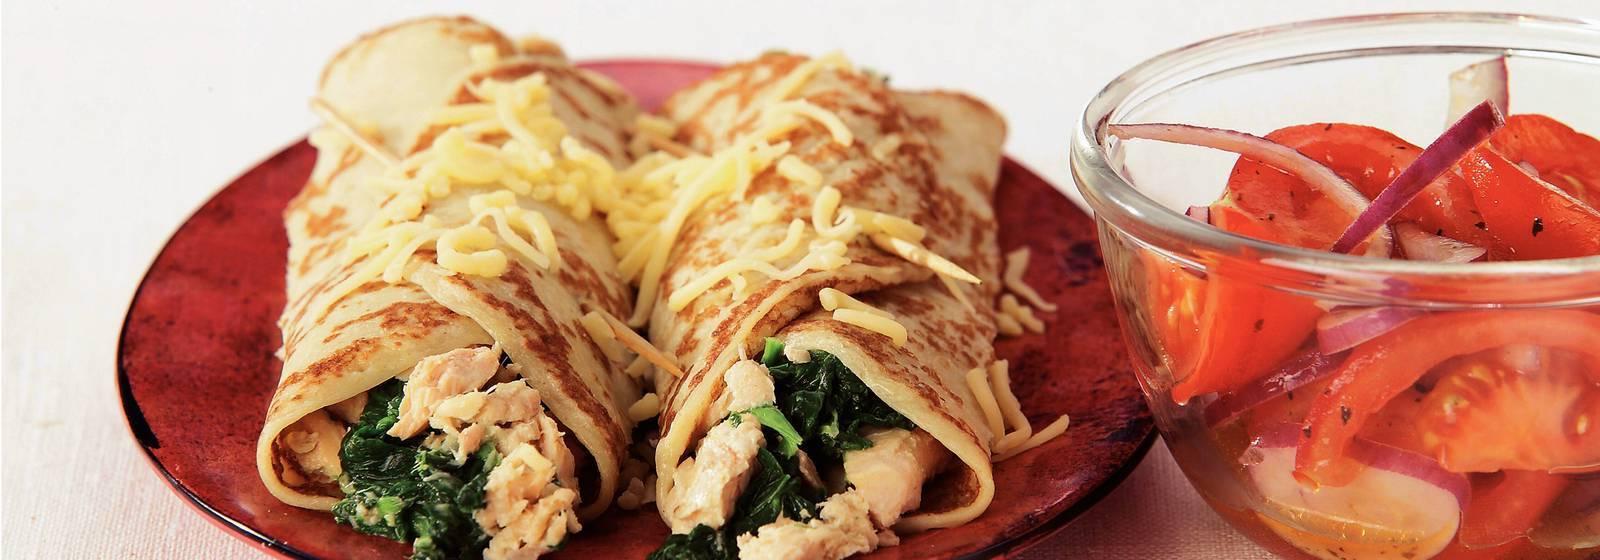 Spinach salmon pancakes